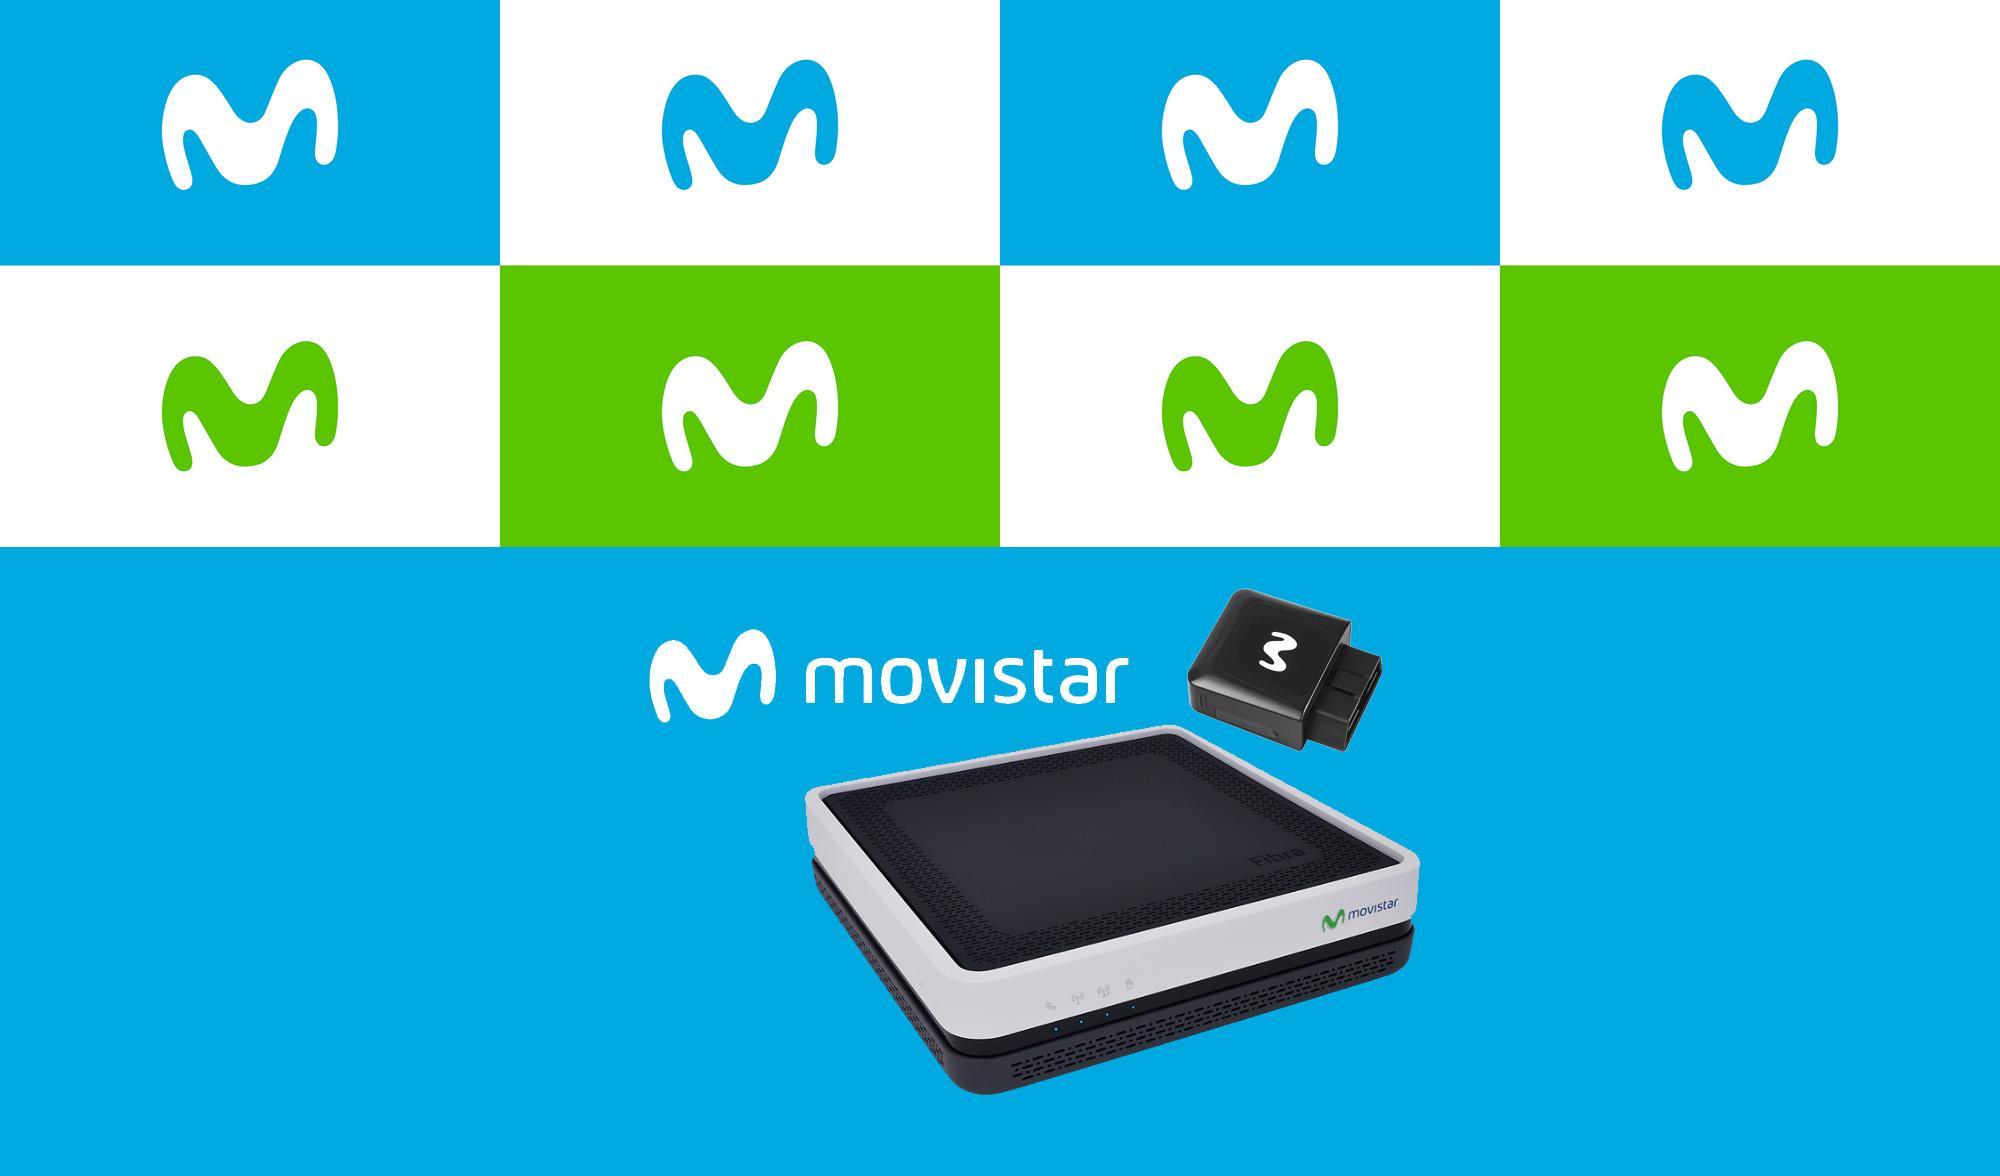 Movistar fusion+